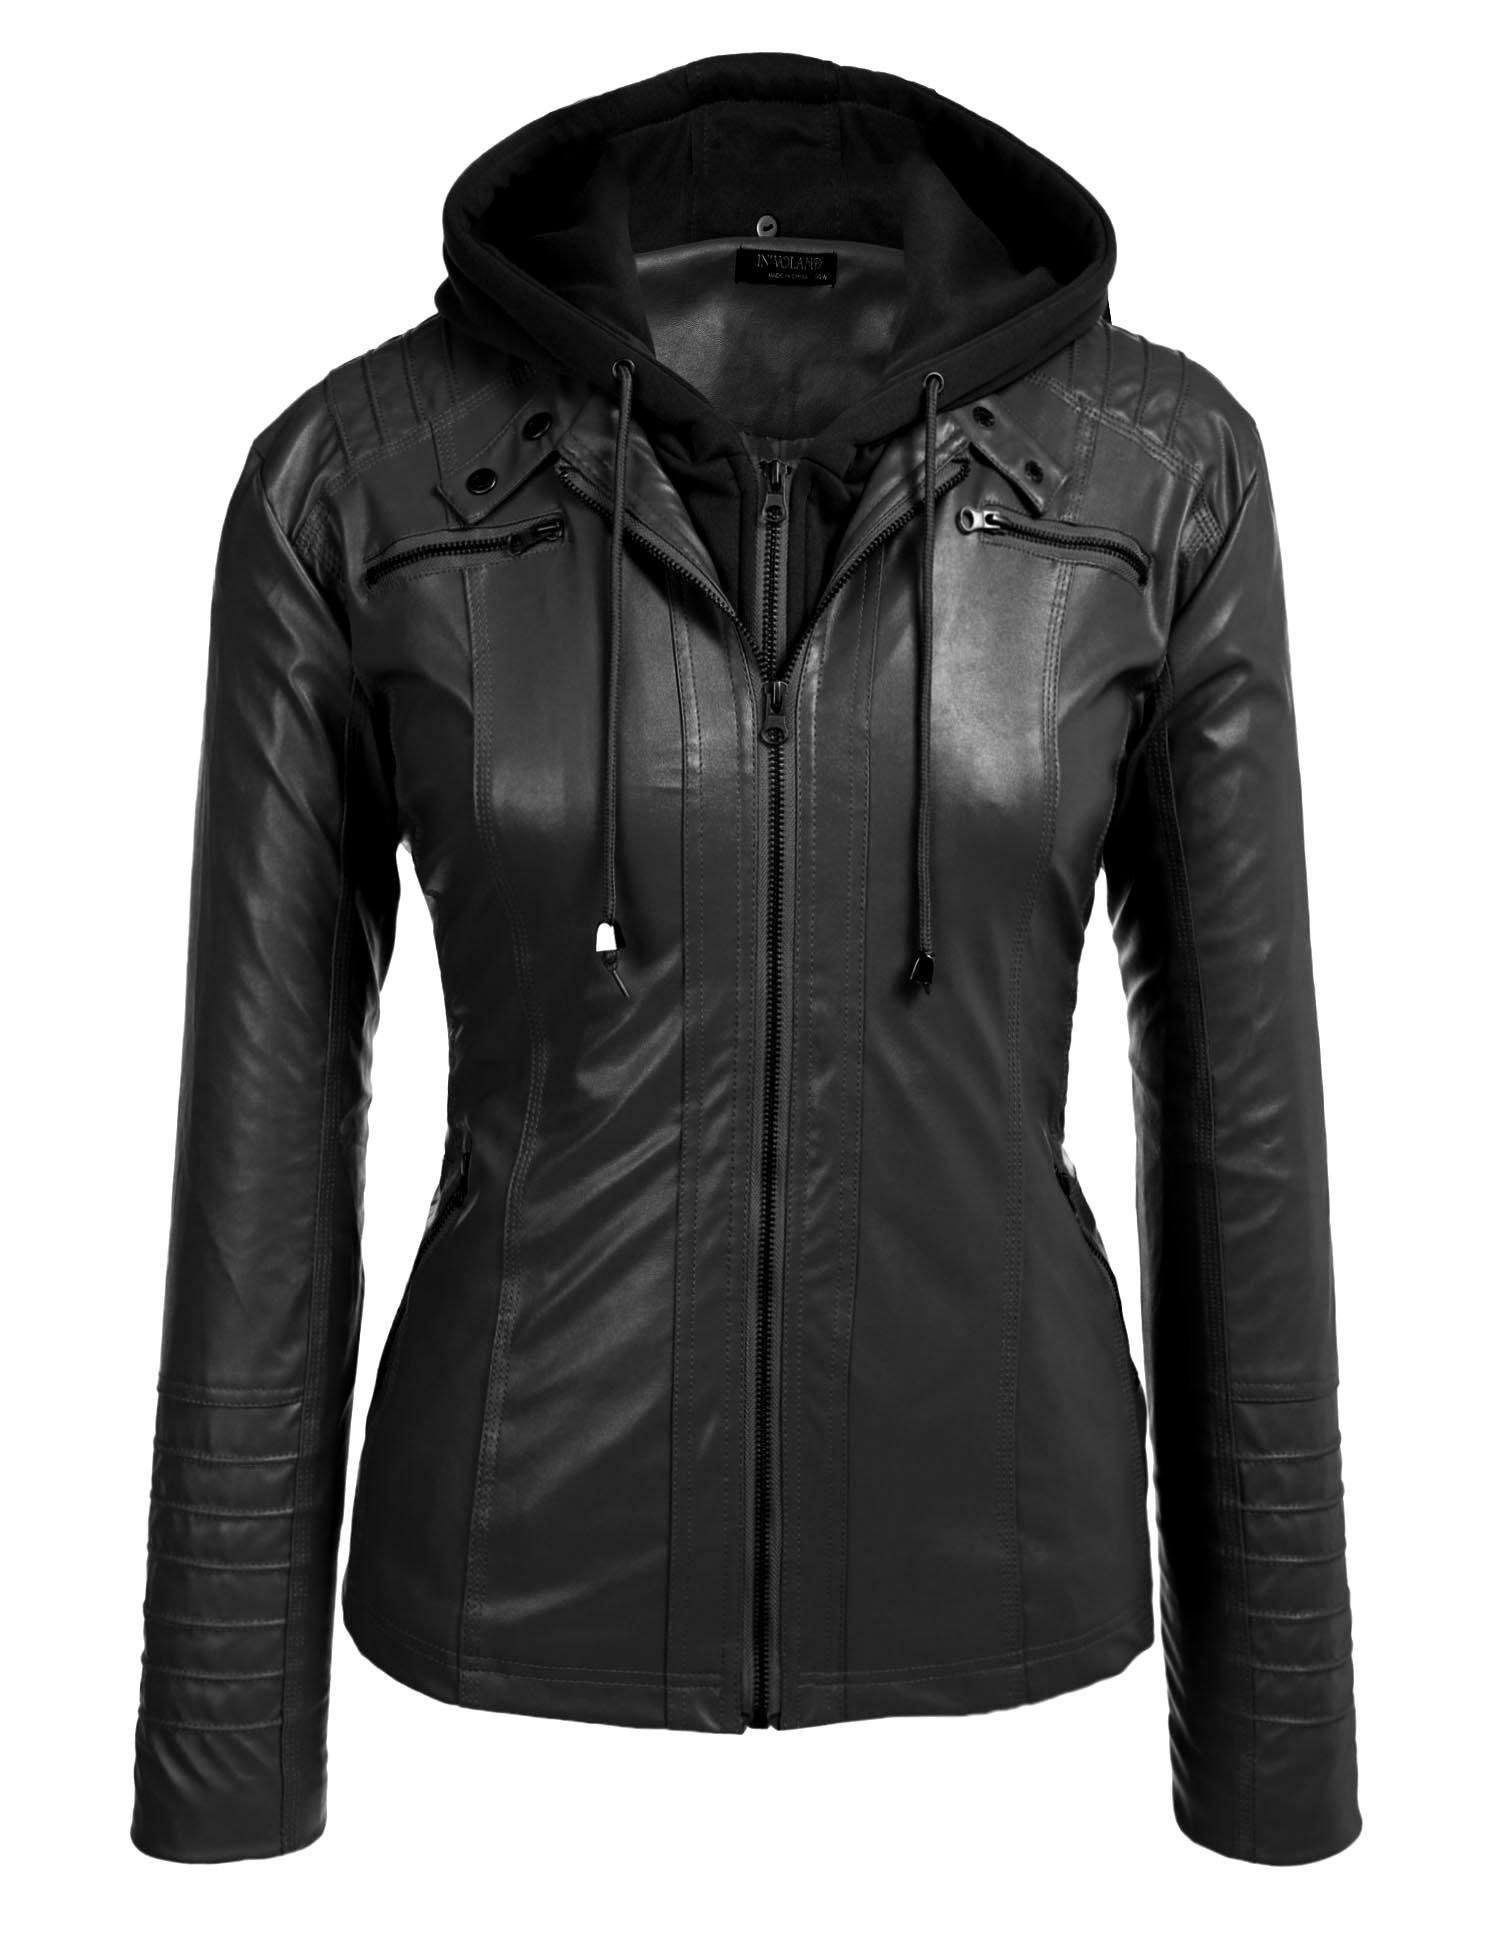 Involand Womens Plus Size Faux Leather Moto Biker Zip Up Hoodie Jacket, Black 1, 18 Plus